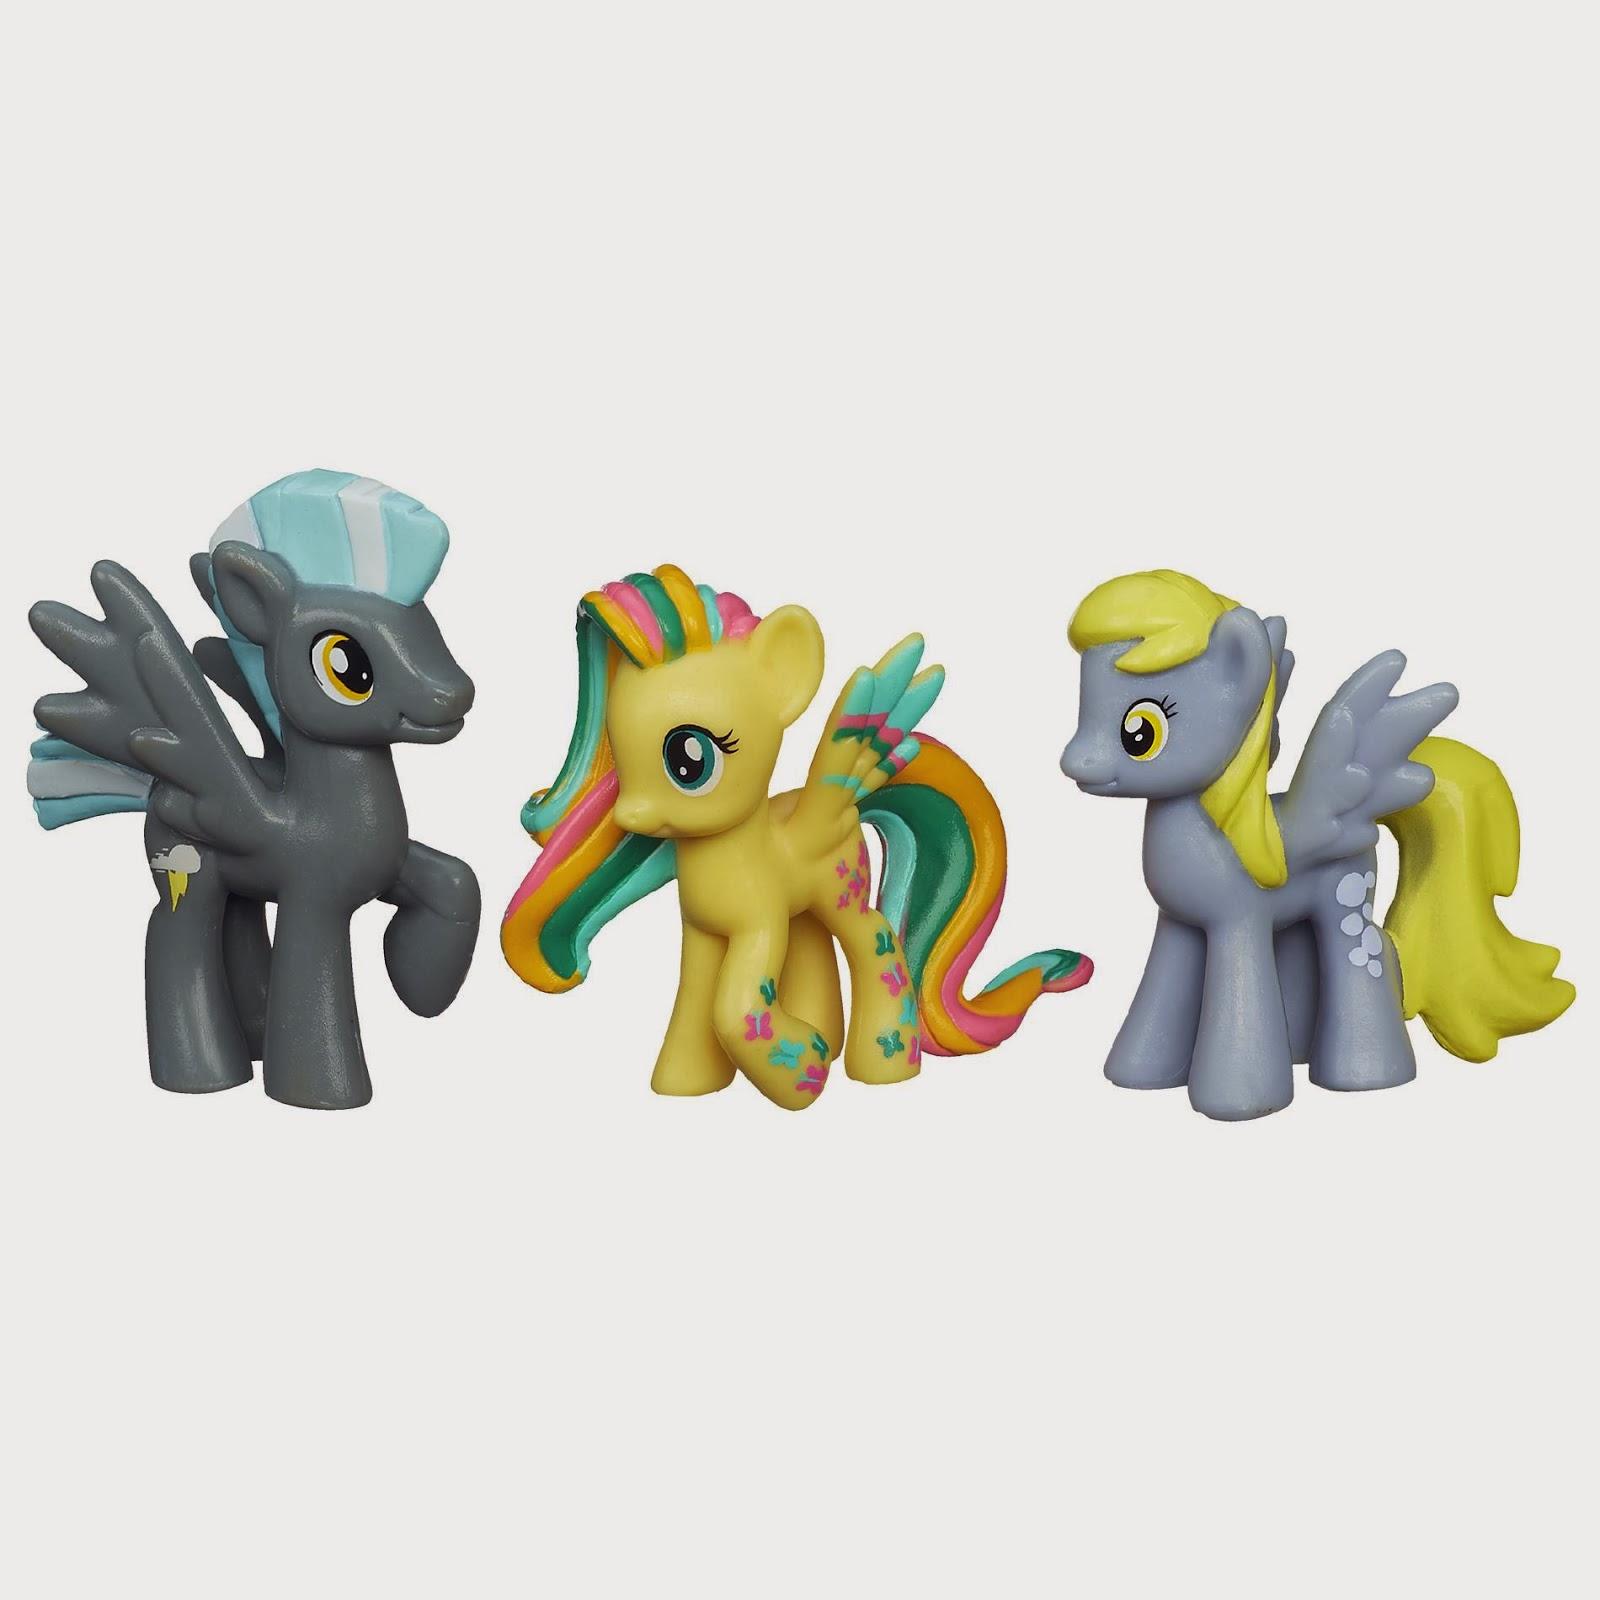 Toys For Ponies : Idle hands toy fair hasbro my little pony rainbow